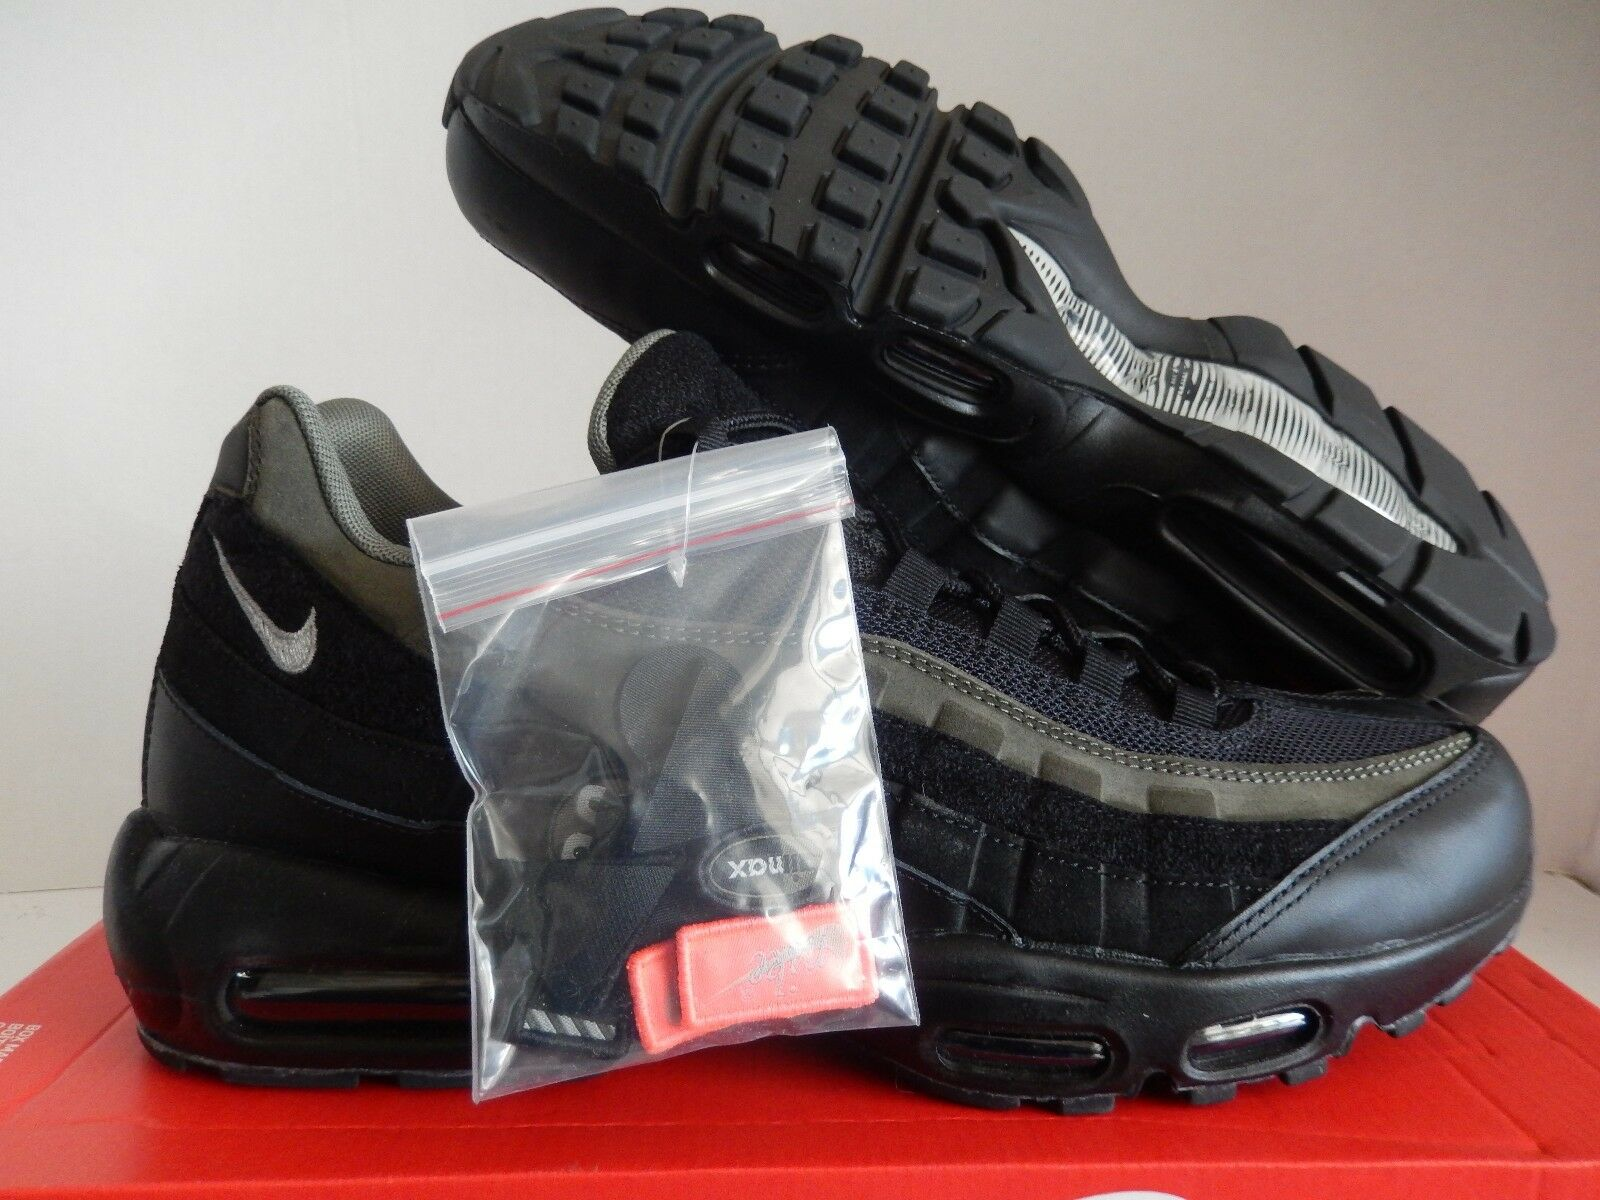 Nike air max max max 95 hal schwarz-schwarz-cargo khaki sz 10 [ah8444-001] d24bb3